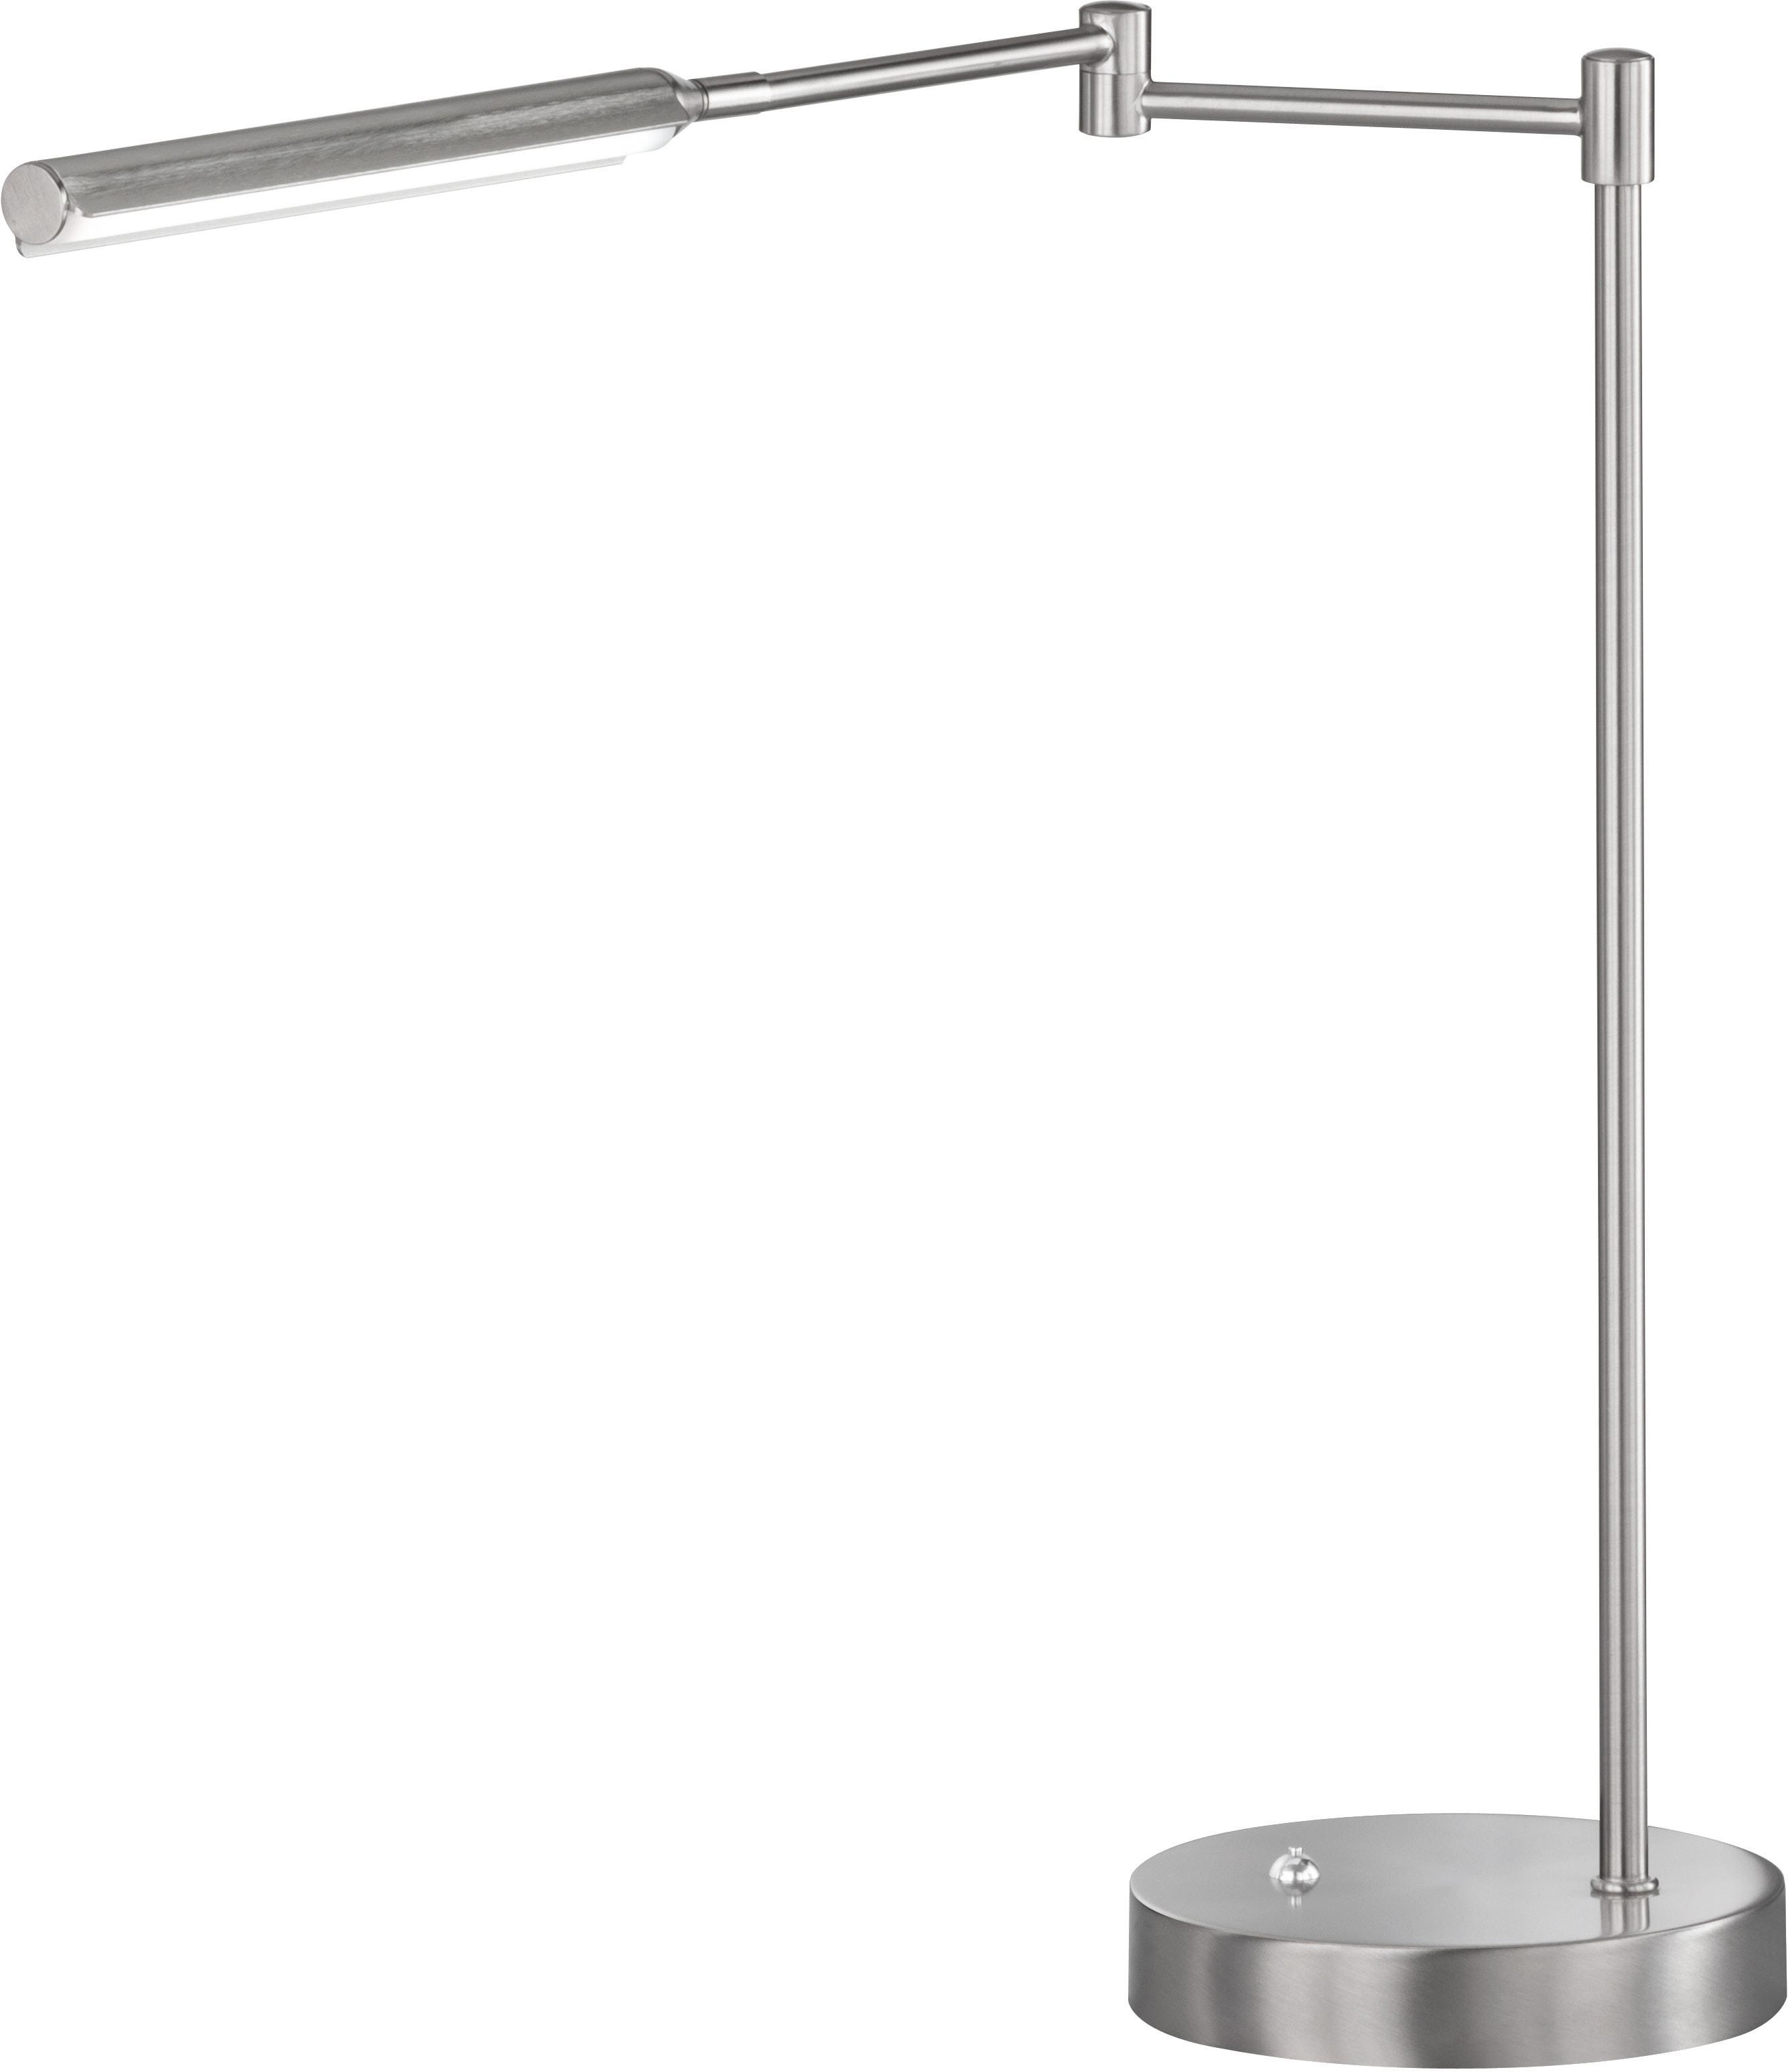 FISCHER & HONSEL LED Tischleuchte Nami, LED-Board, 1 St., Farbwechsler